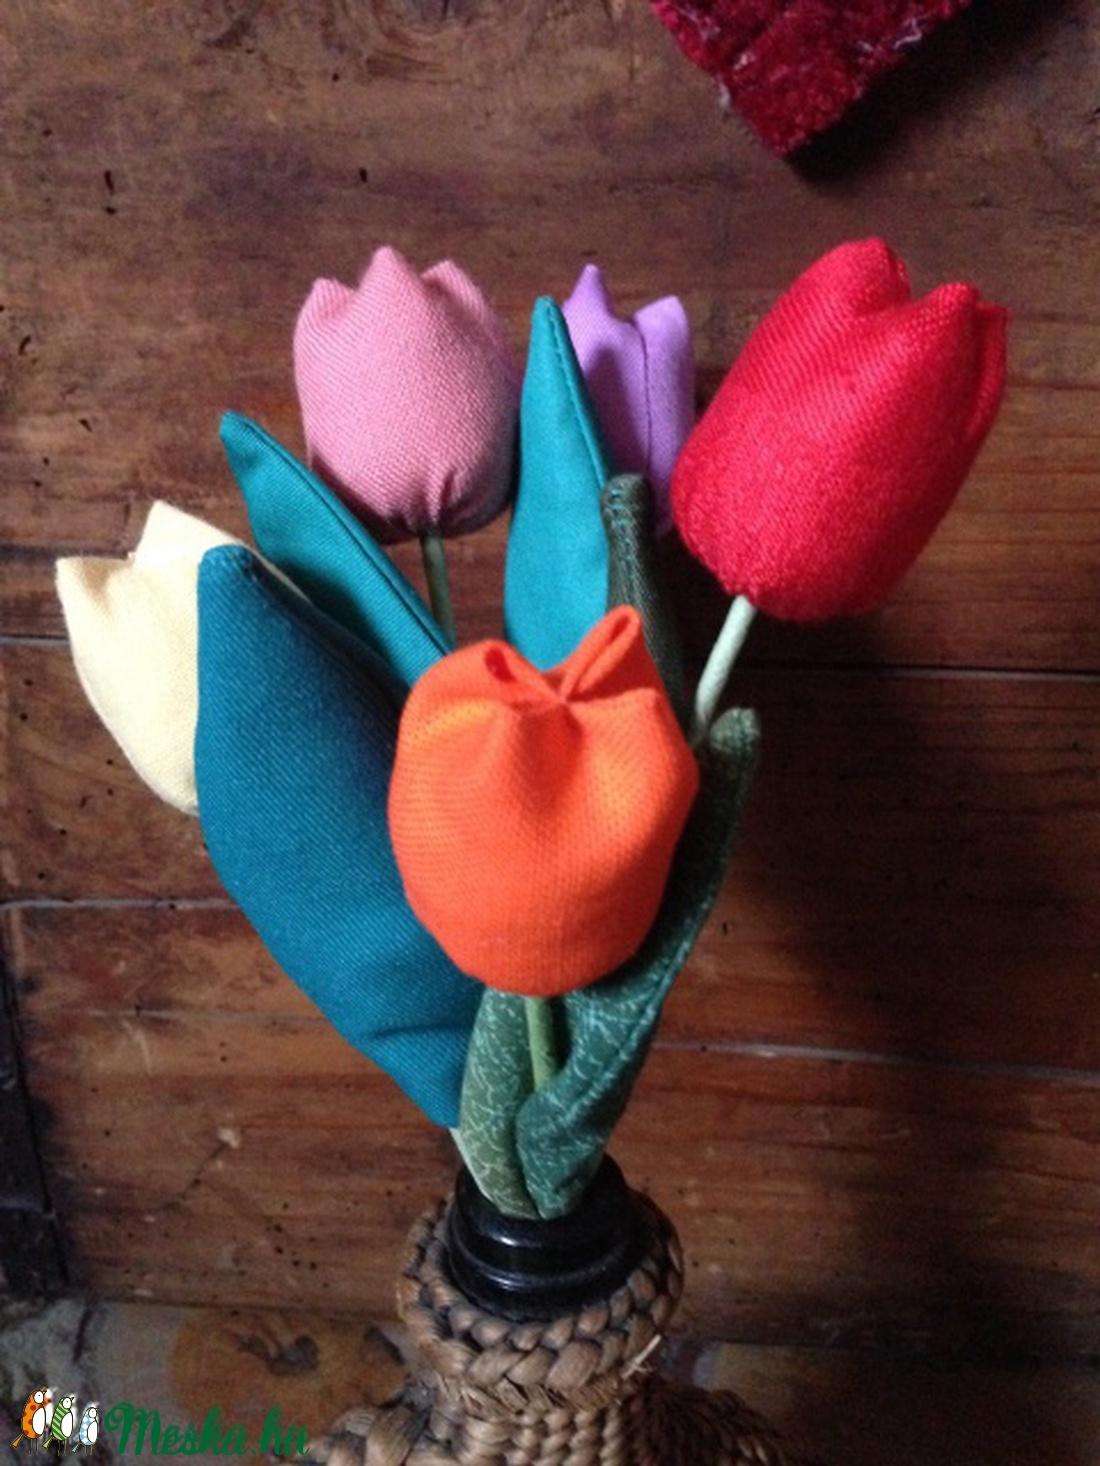 Textil tulipán (eggart) - Meska.hu 3e8c08ec9e